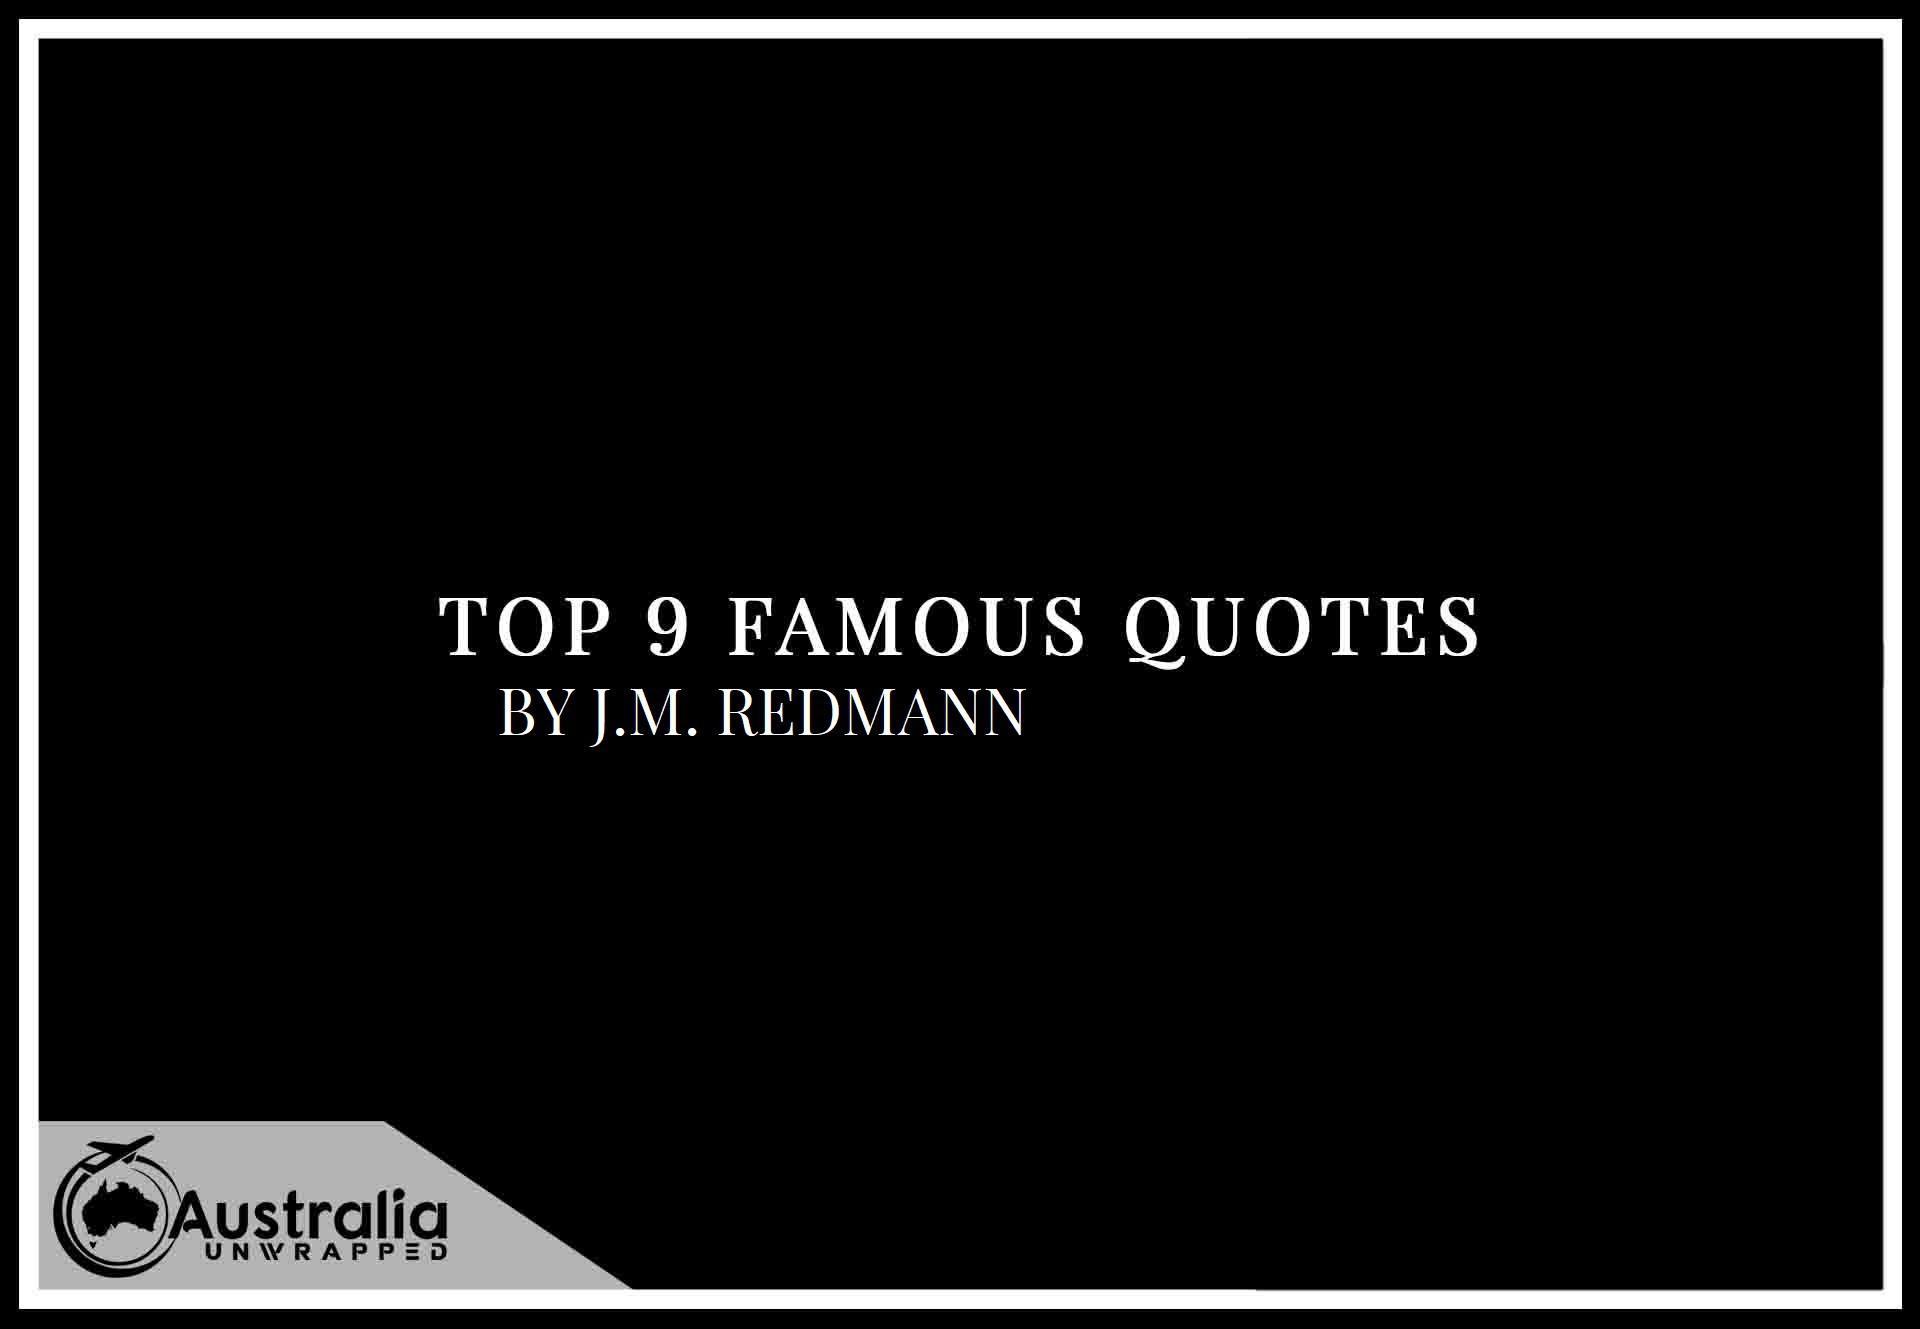 Top 9 Famous Quotes by Author J.M. Redmann